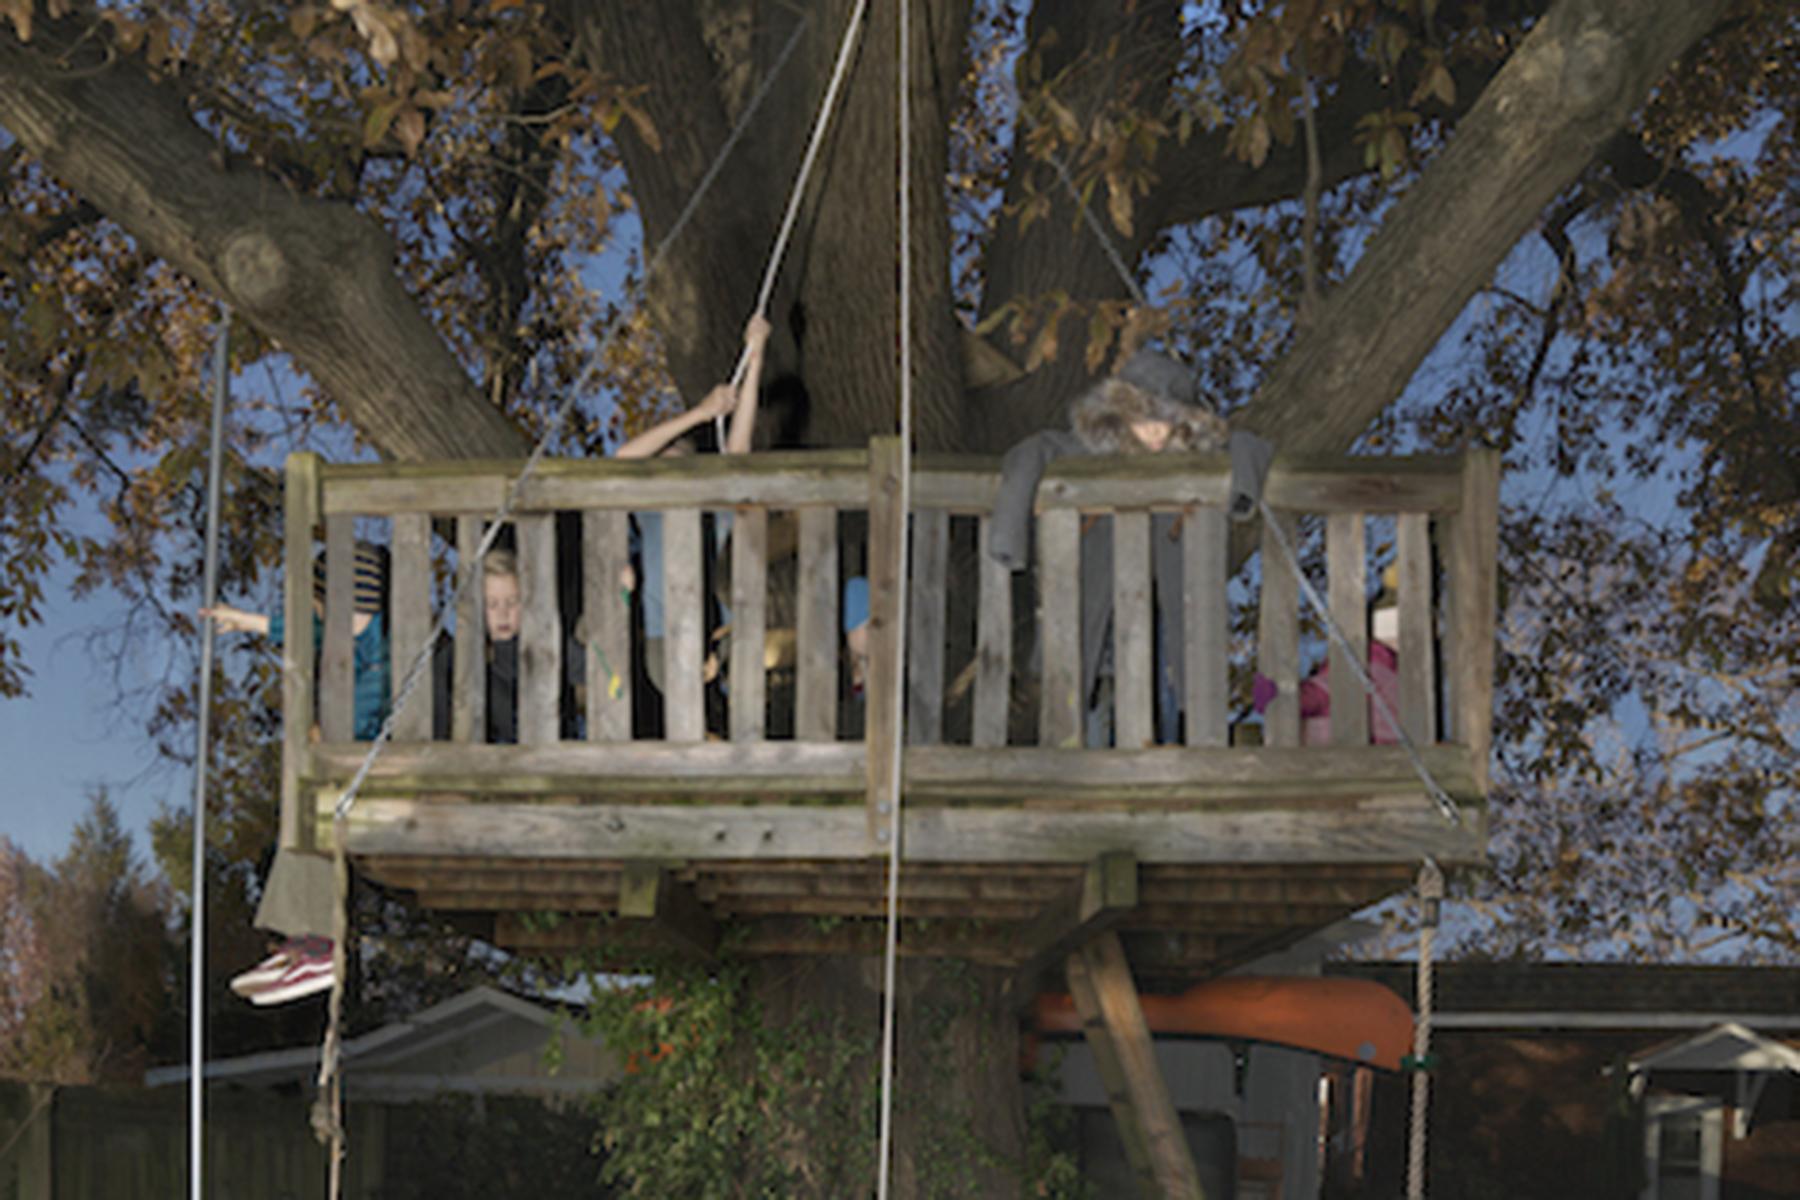 Improvising: New Photographs by Julie Blackmon (Upcoming 2021)